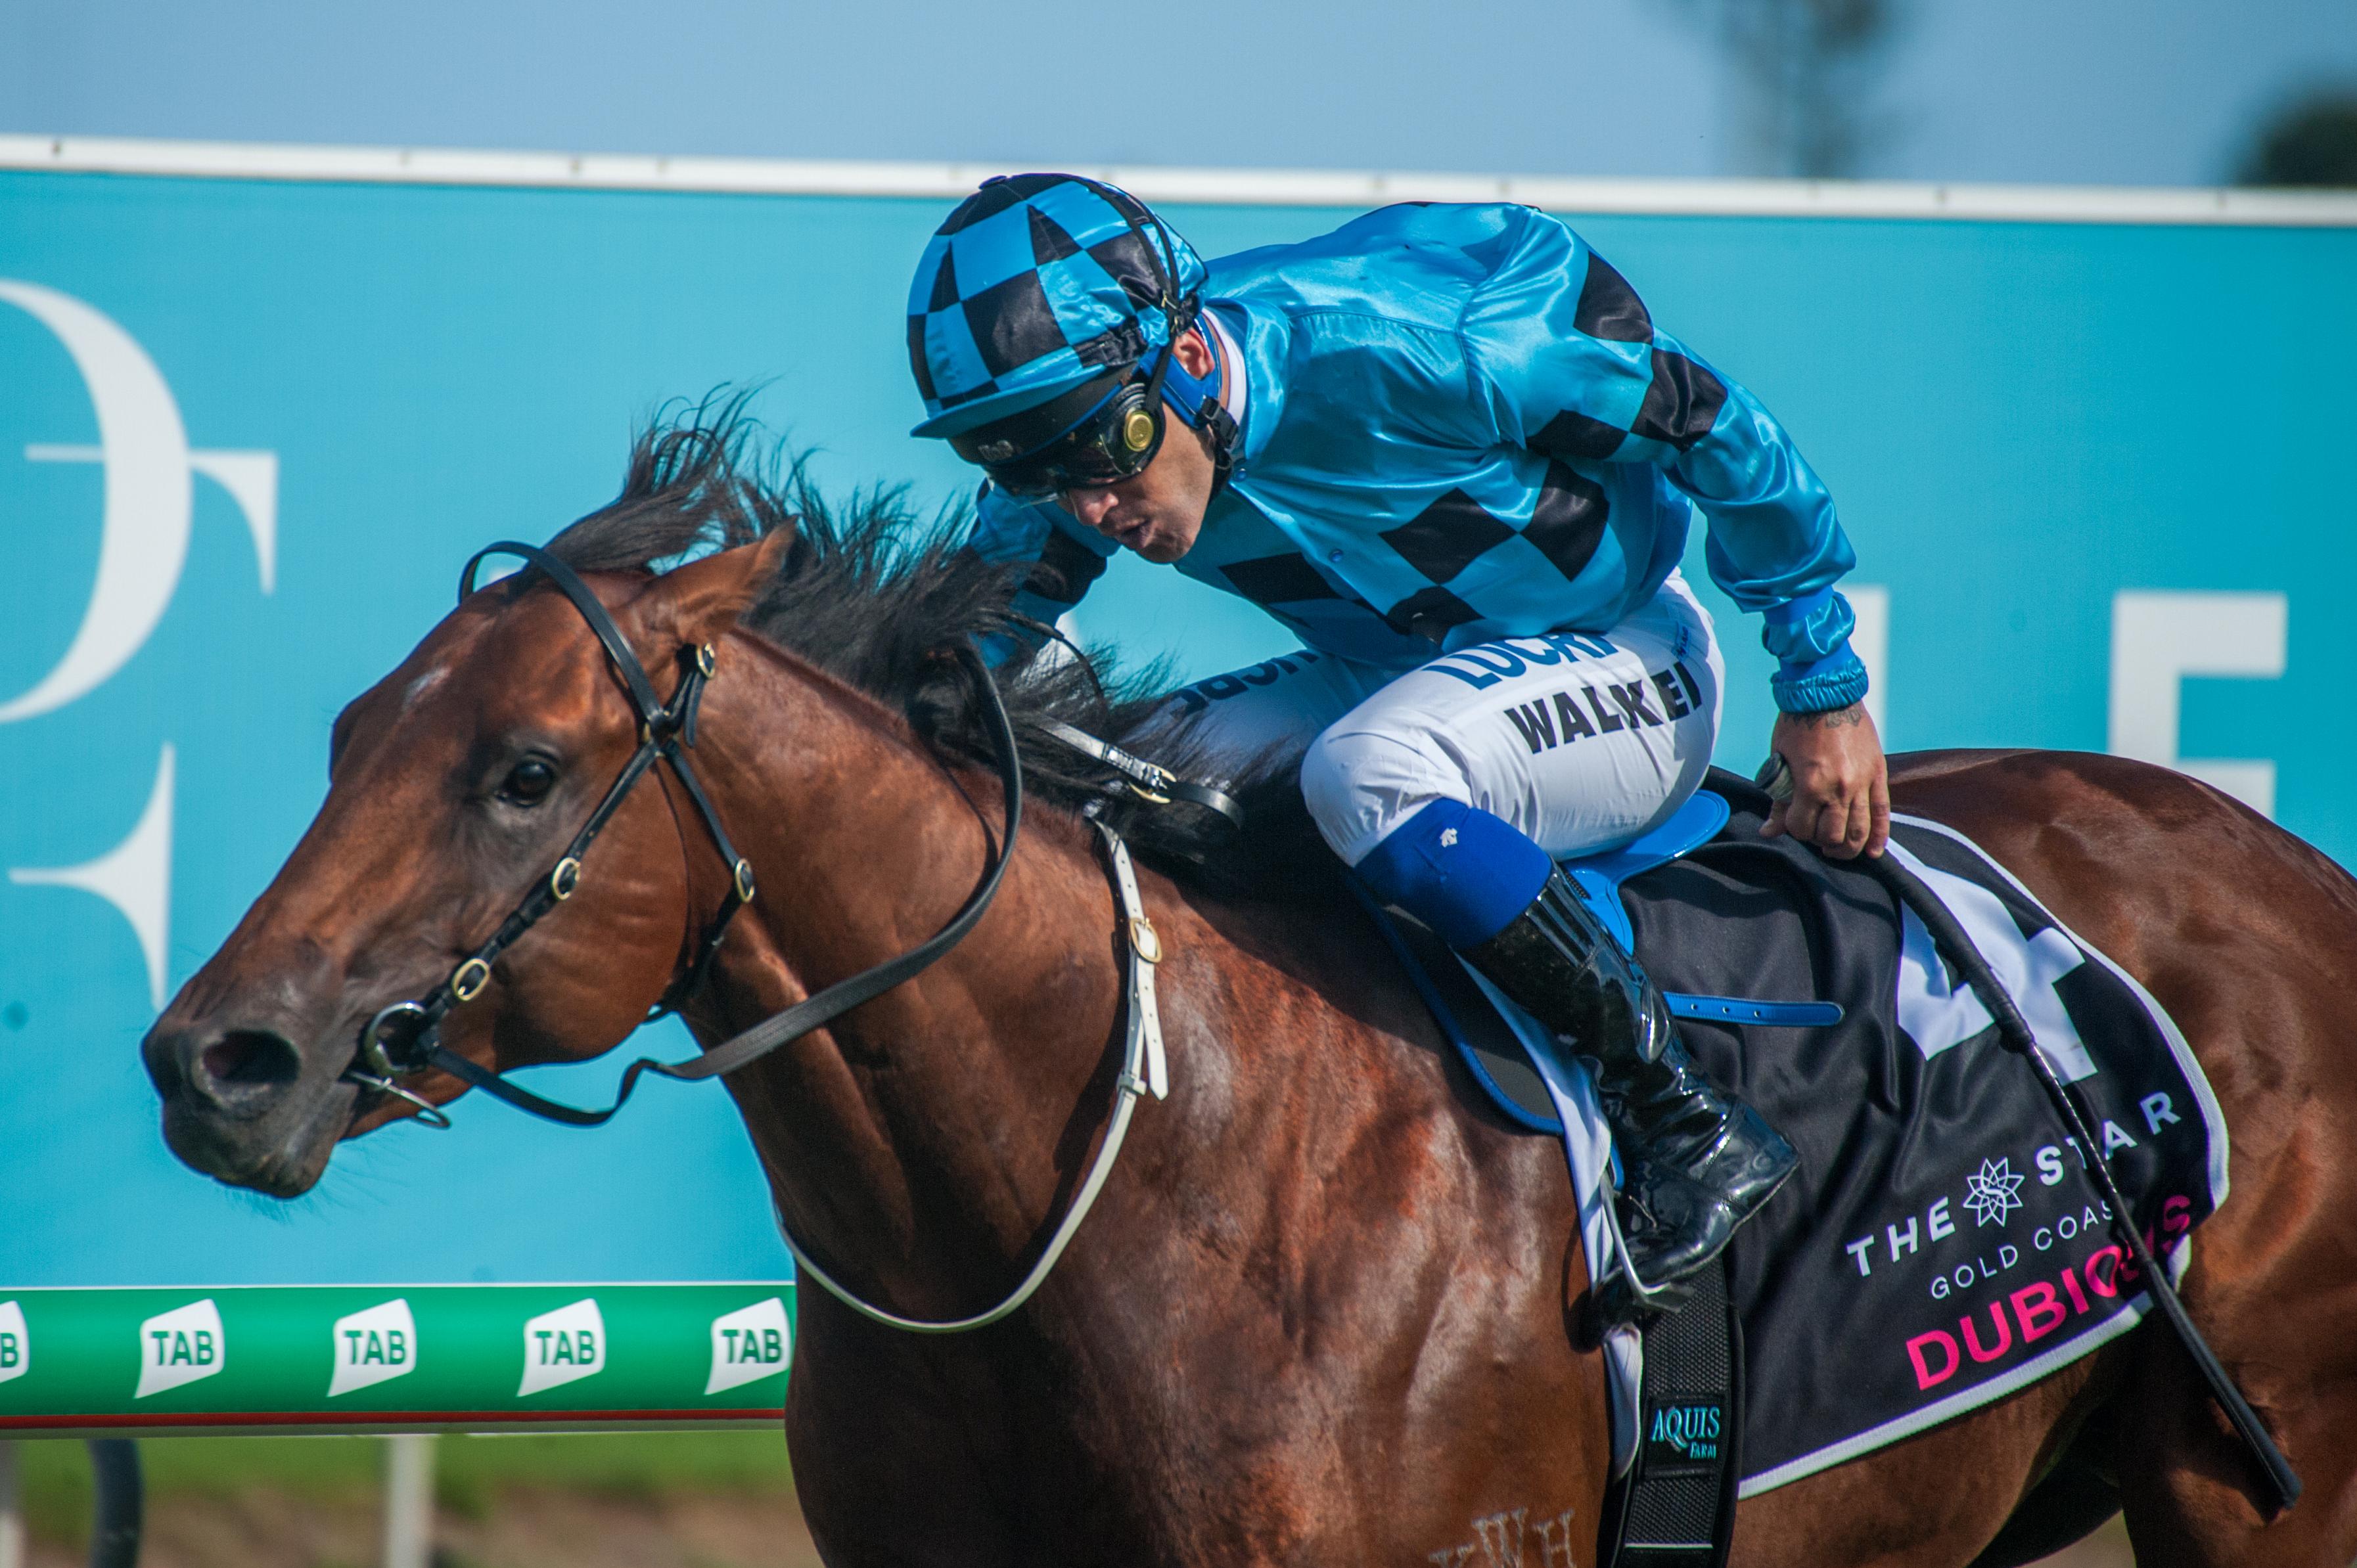 https://www.stallions.com.au/wp-content/uploads/2020/05/Race-8-Dubious-Michael-Walker_12-01-19-MM-Mark-Lee_0709.jpg